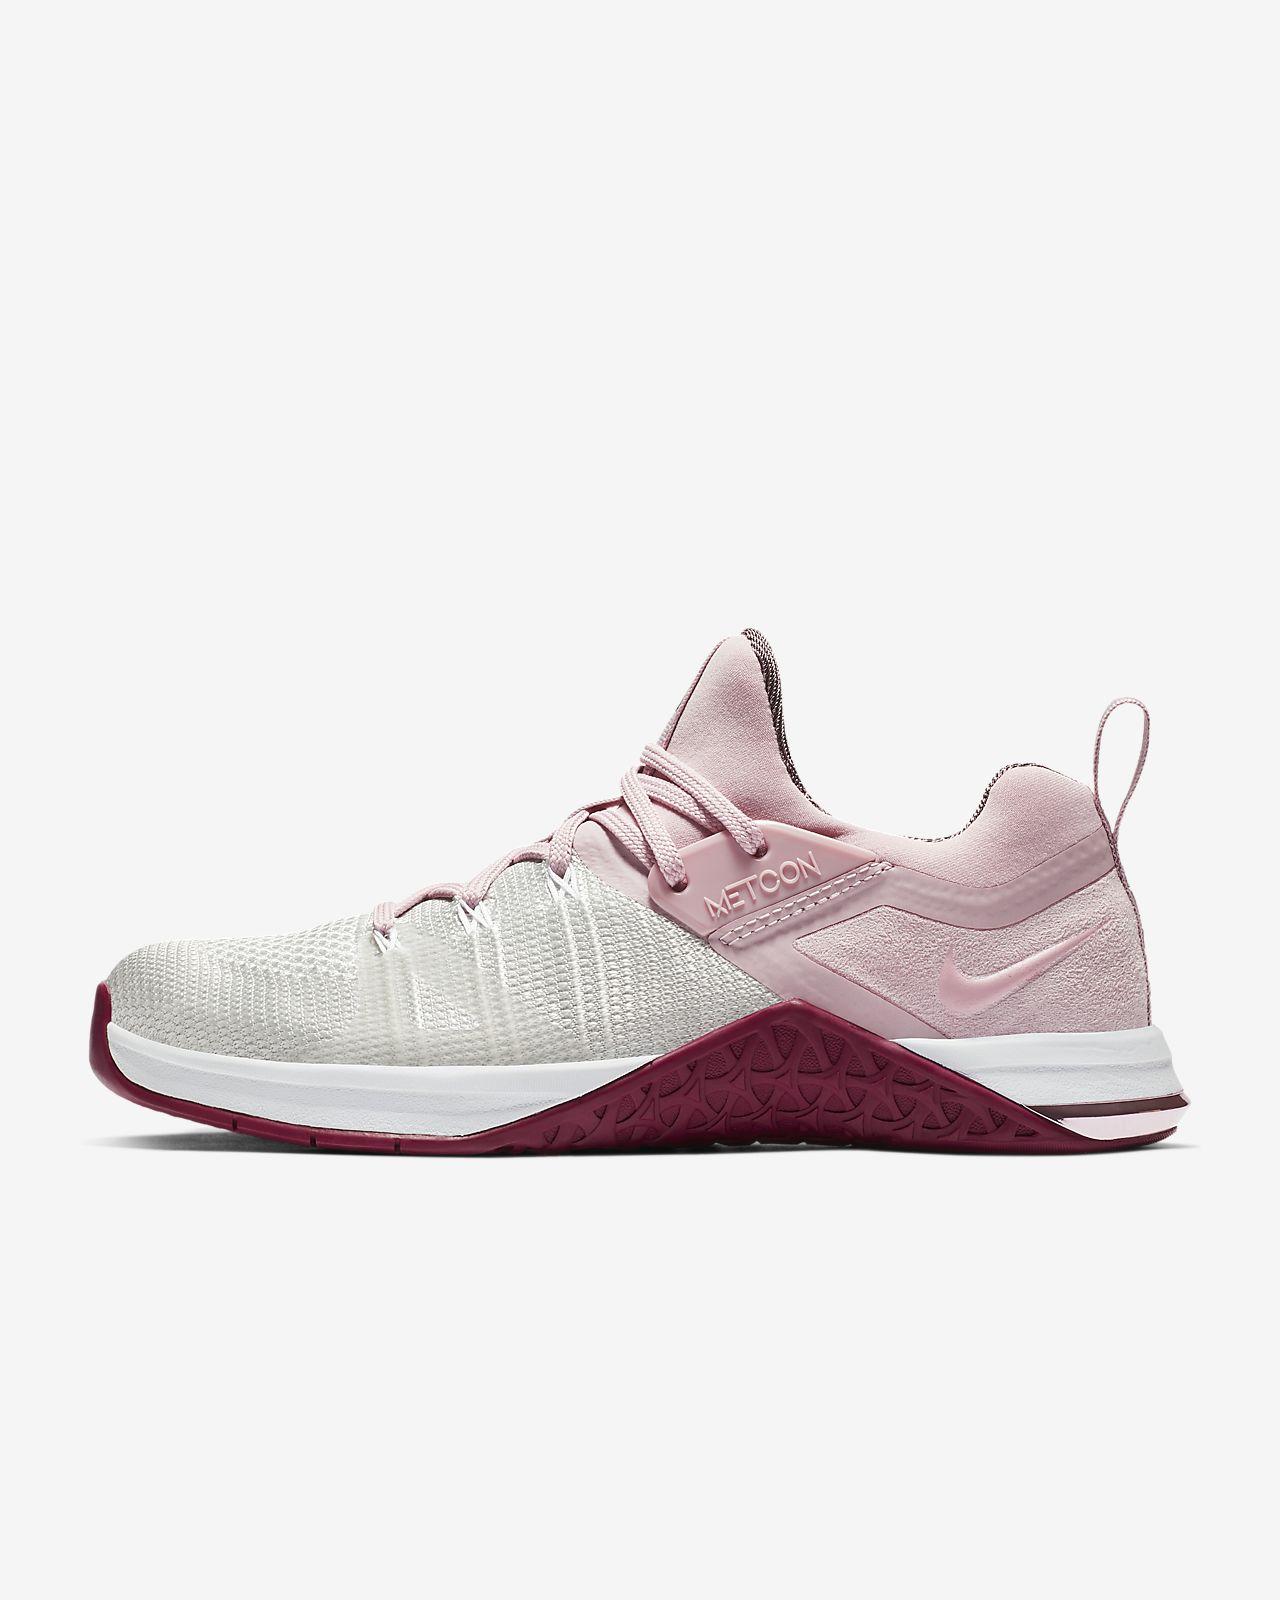 Nike Metcon Flyknit 3 Women's Cross-Training/Weightlifting Shoe